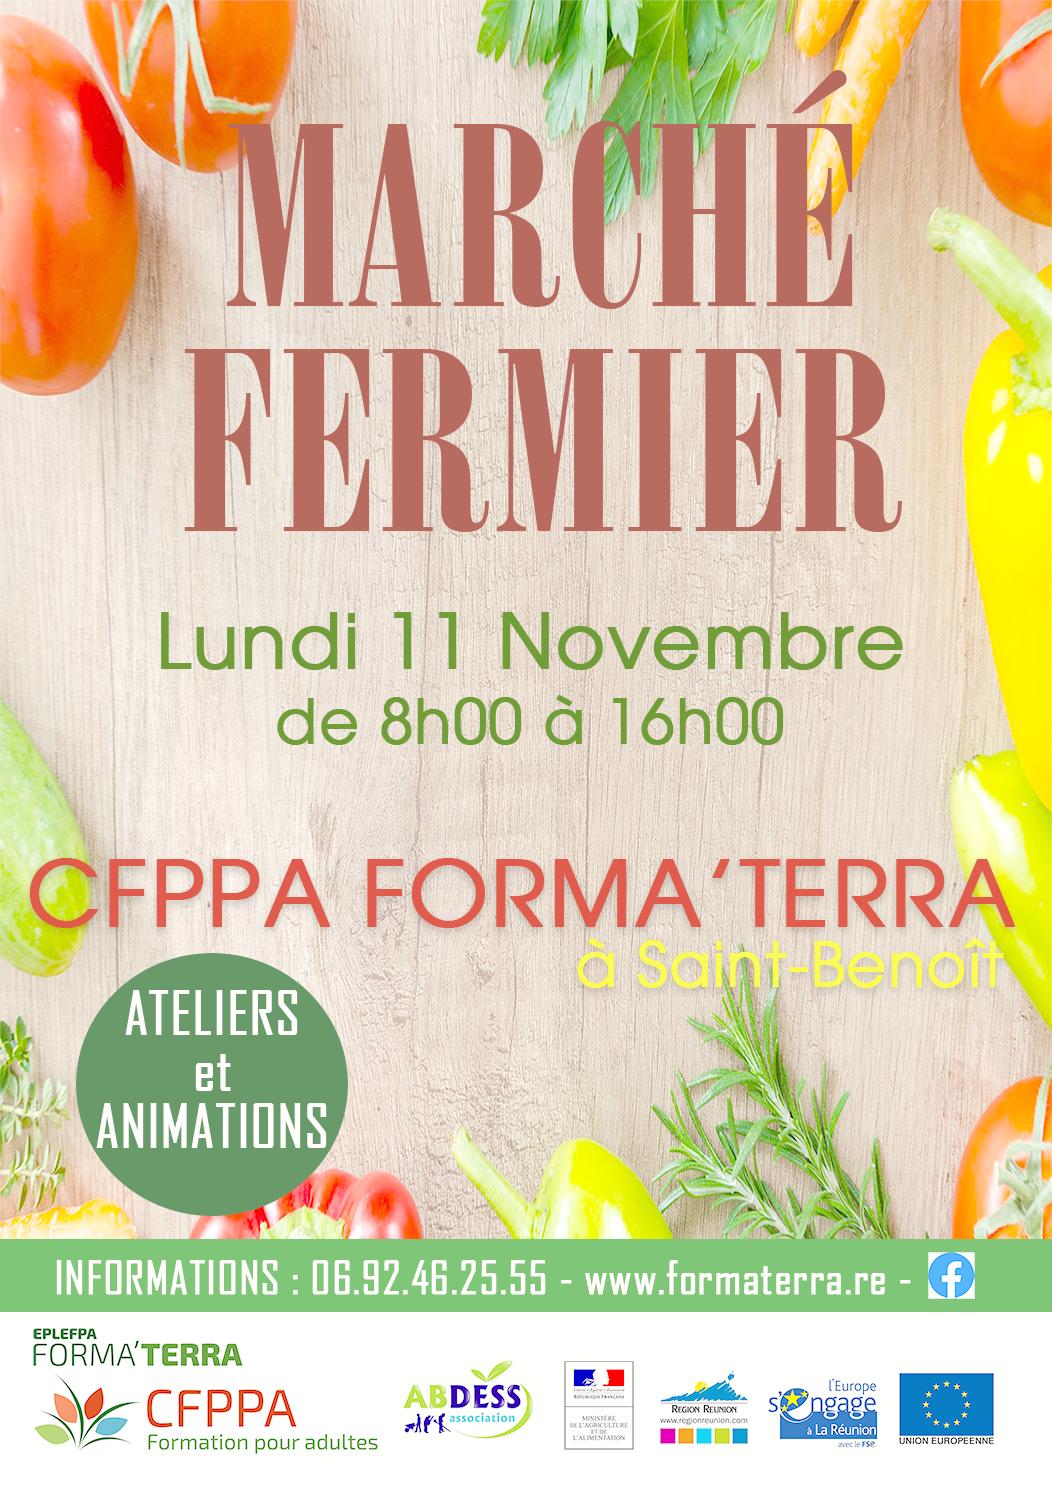 Affiche_marche_fermier_CFPPA_StBenoit_11nov_@0,3x